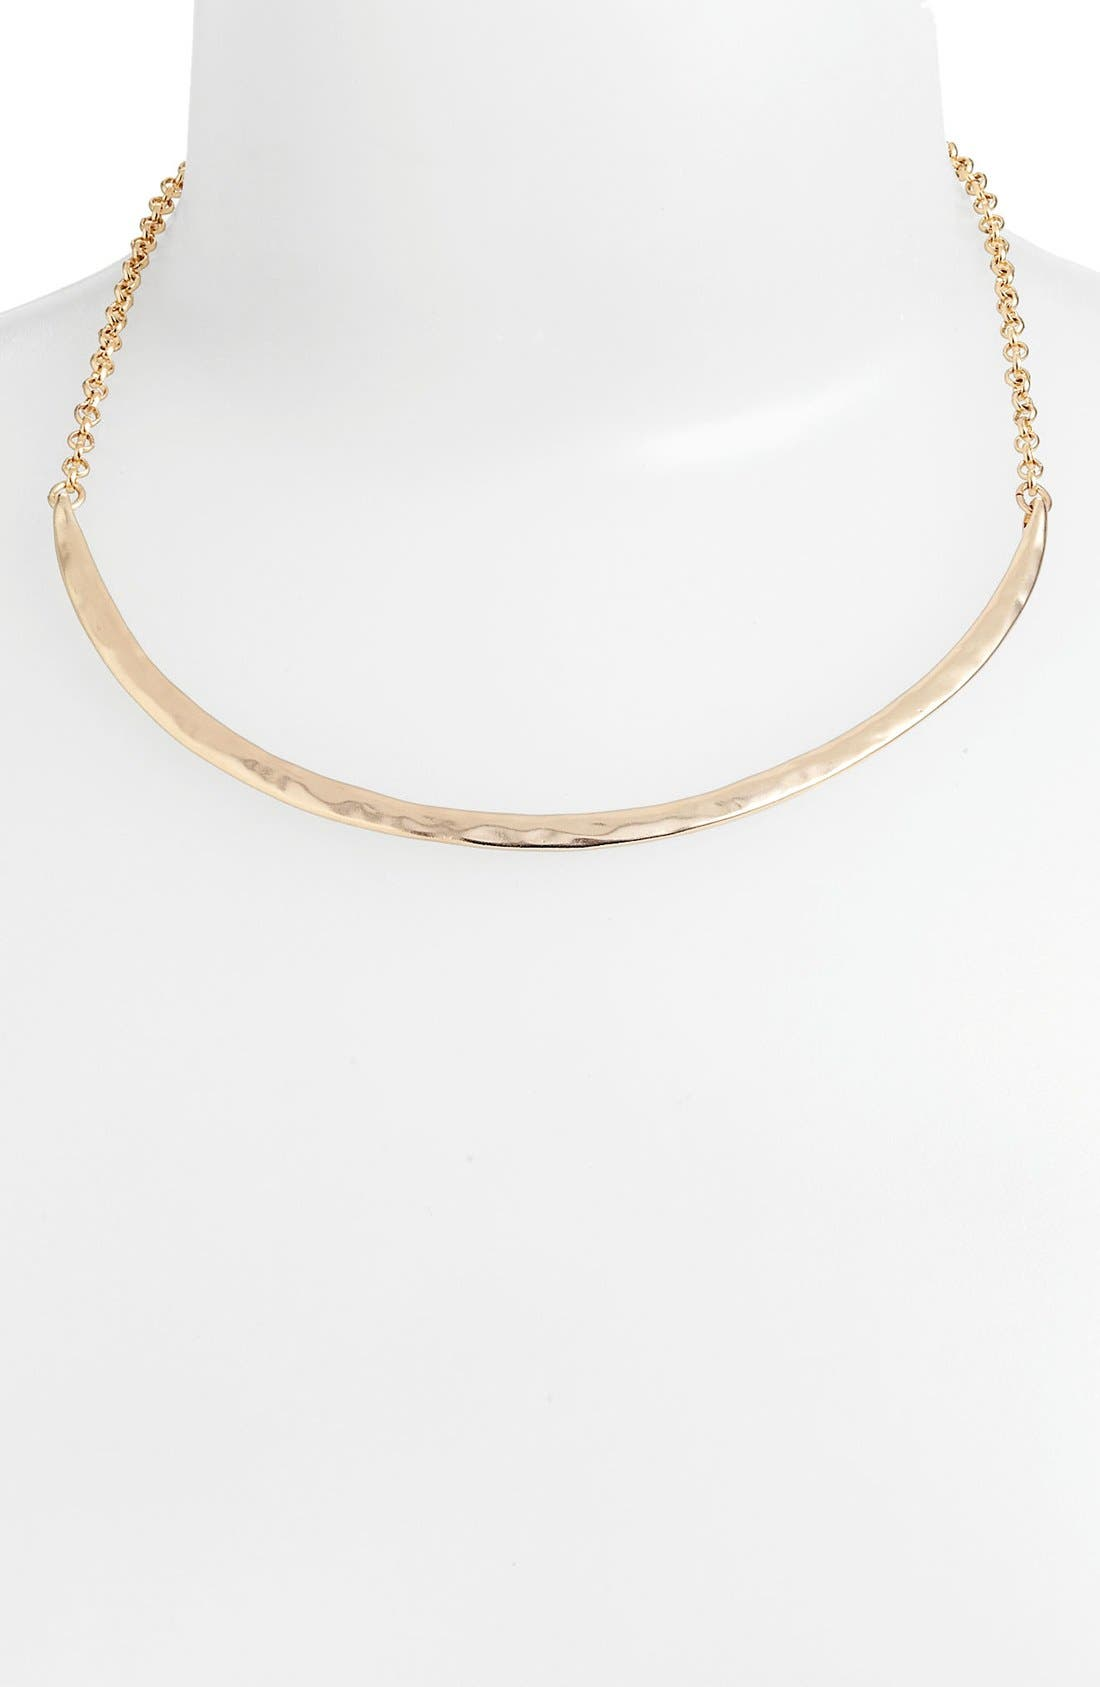 Main Image - Nordstrom 'Azteca' Curved Bar Necklace